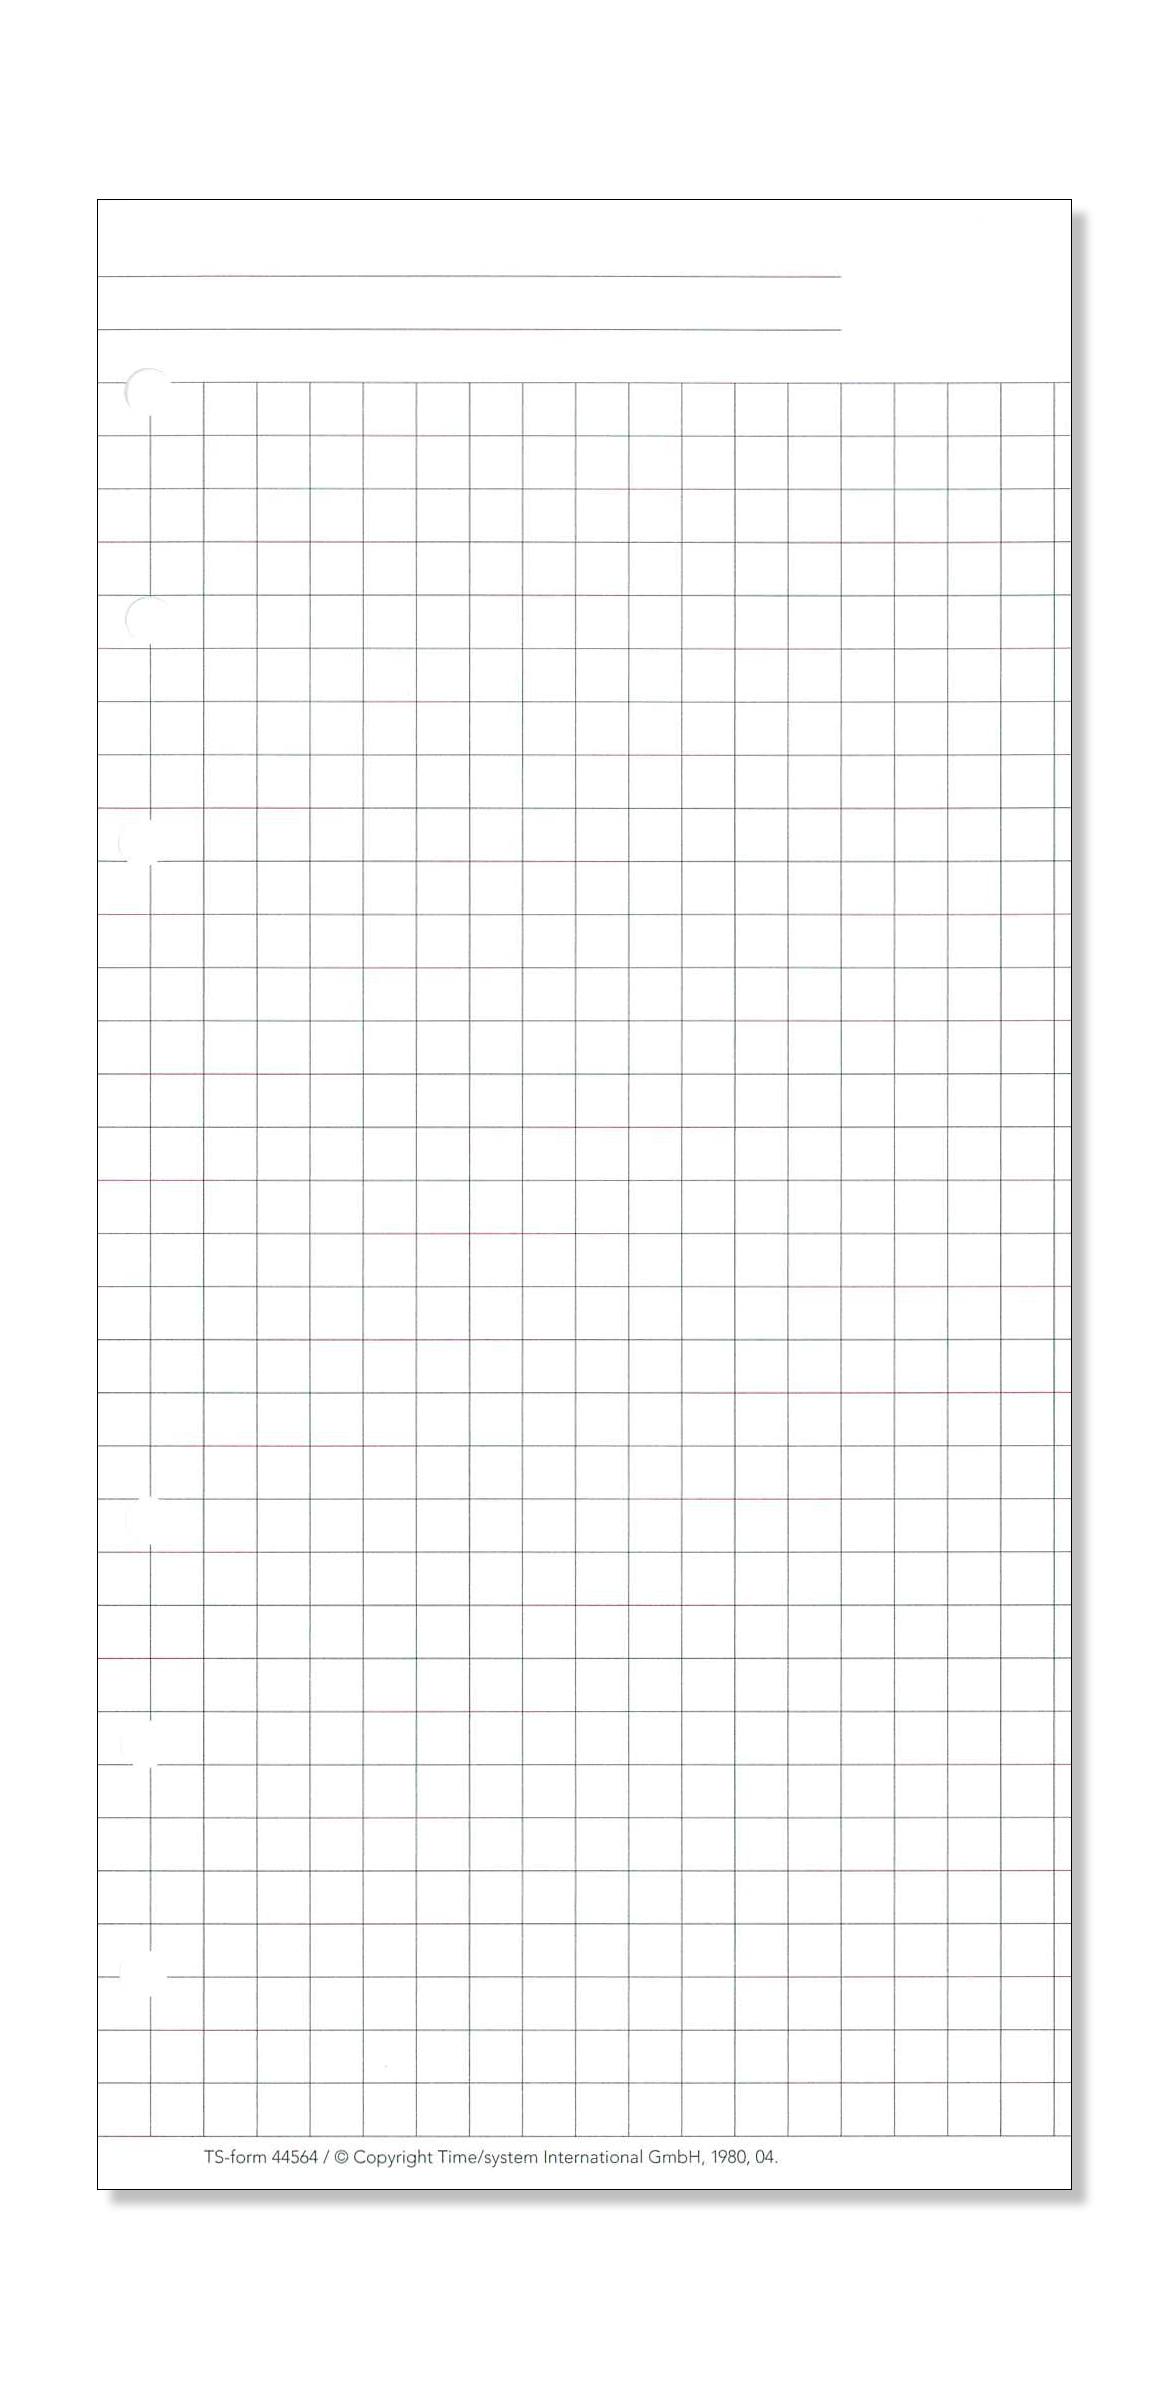 Time/system Compact Formblatt Kariertes Papier bestimmt für Kariertes Blatt